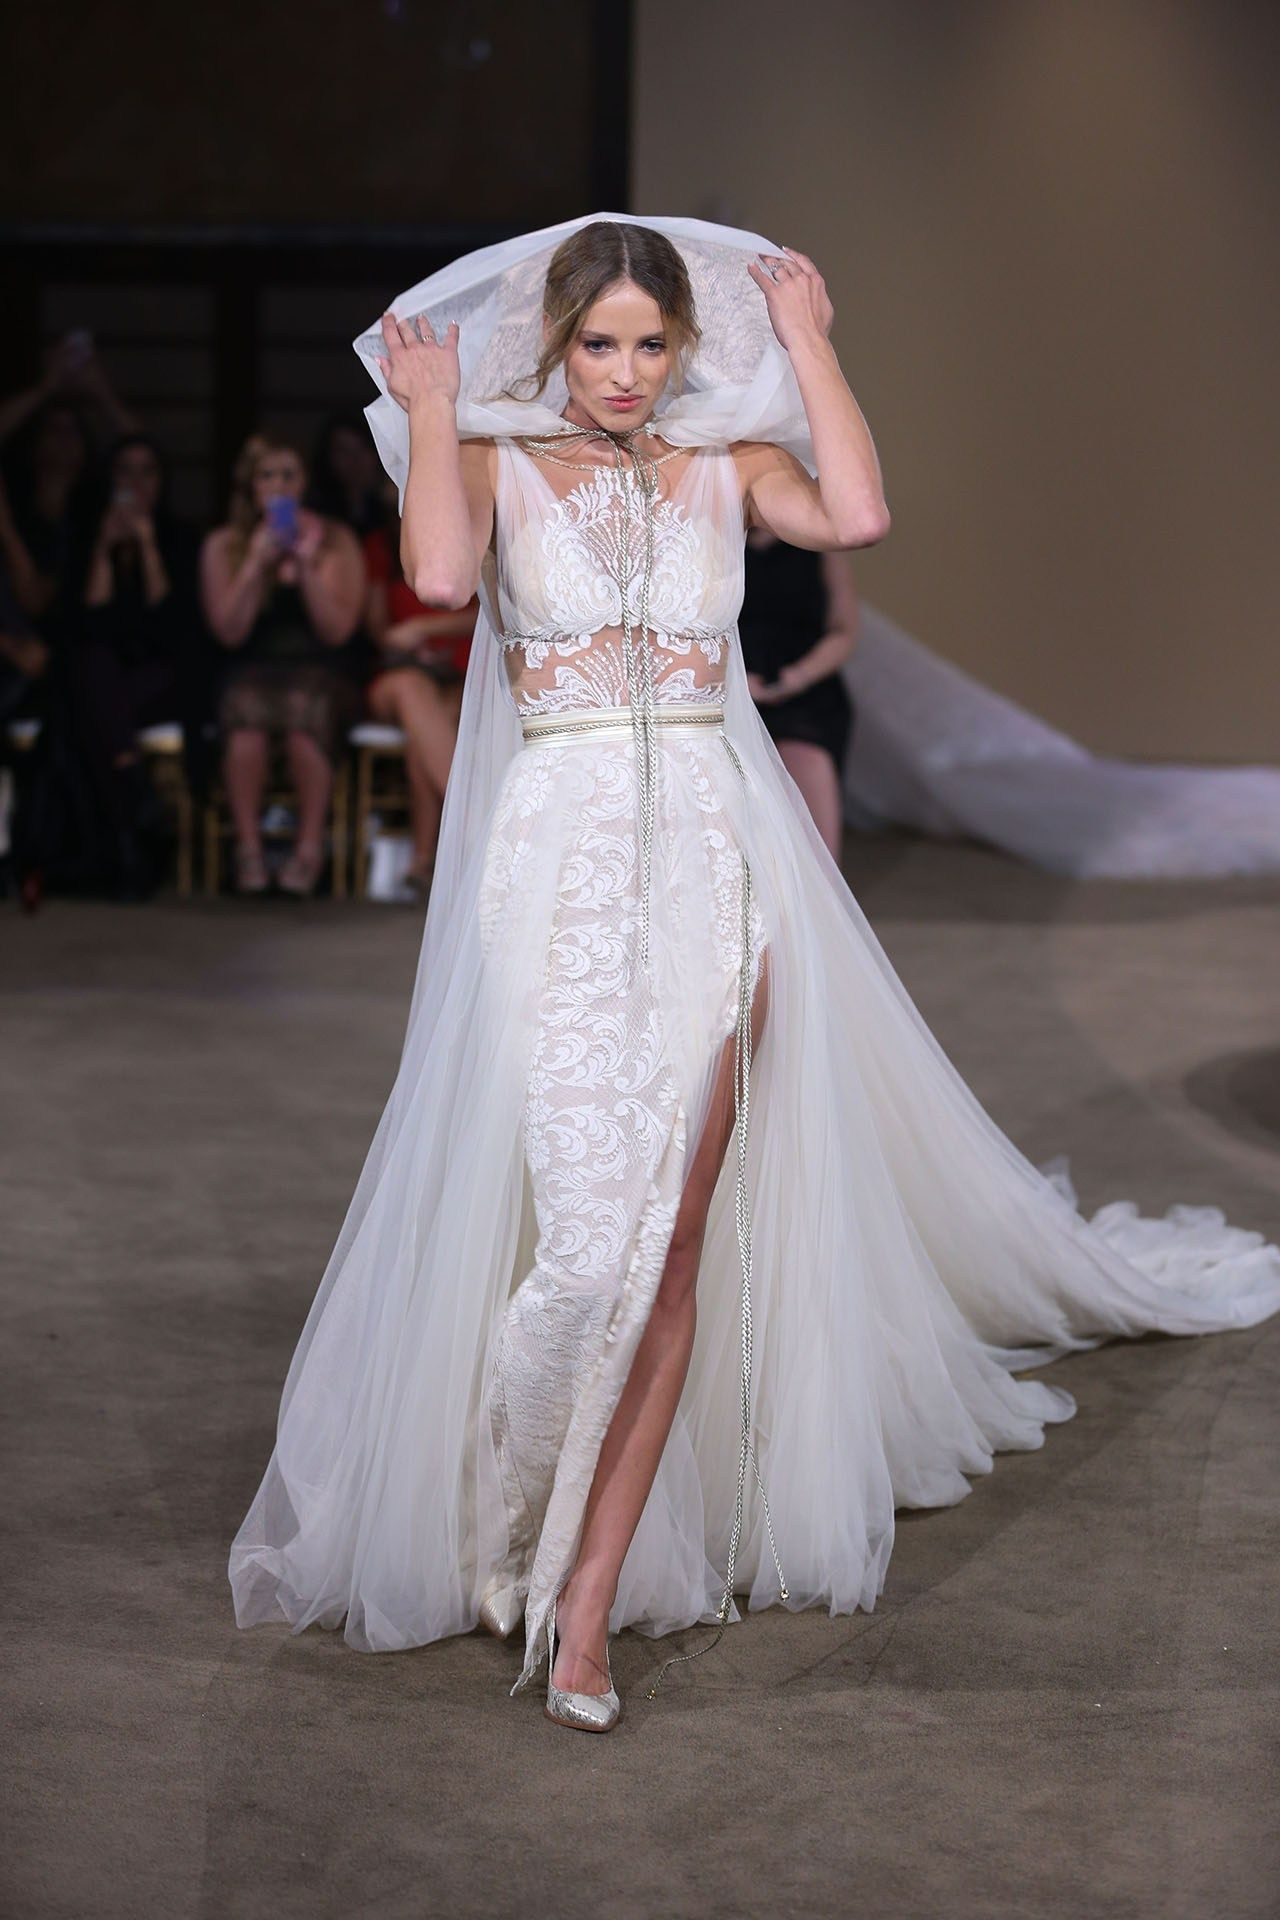 Red lace wedding dress october 2018 Galia Lahav Fall  Collection New York Bridal Market October